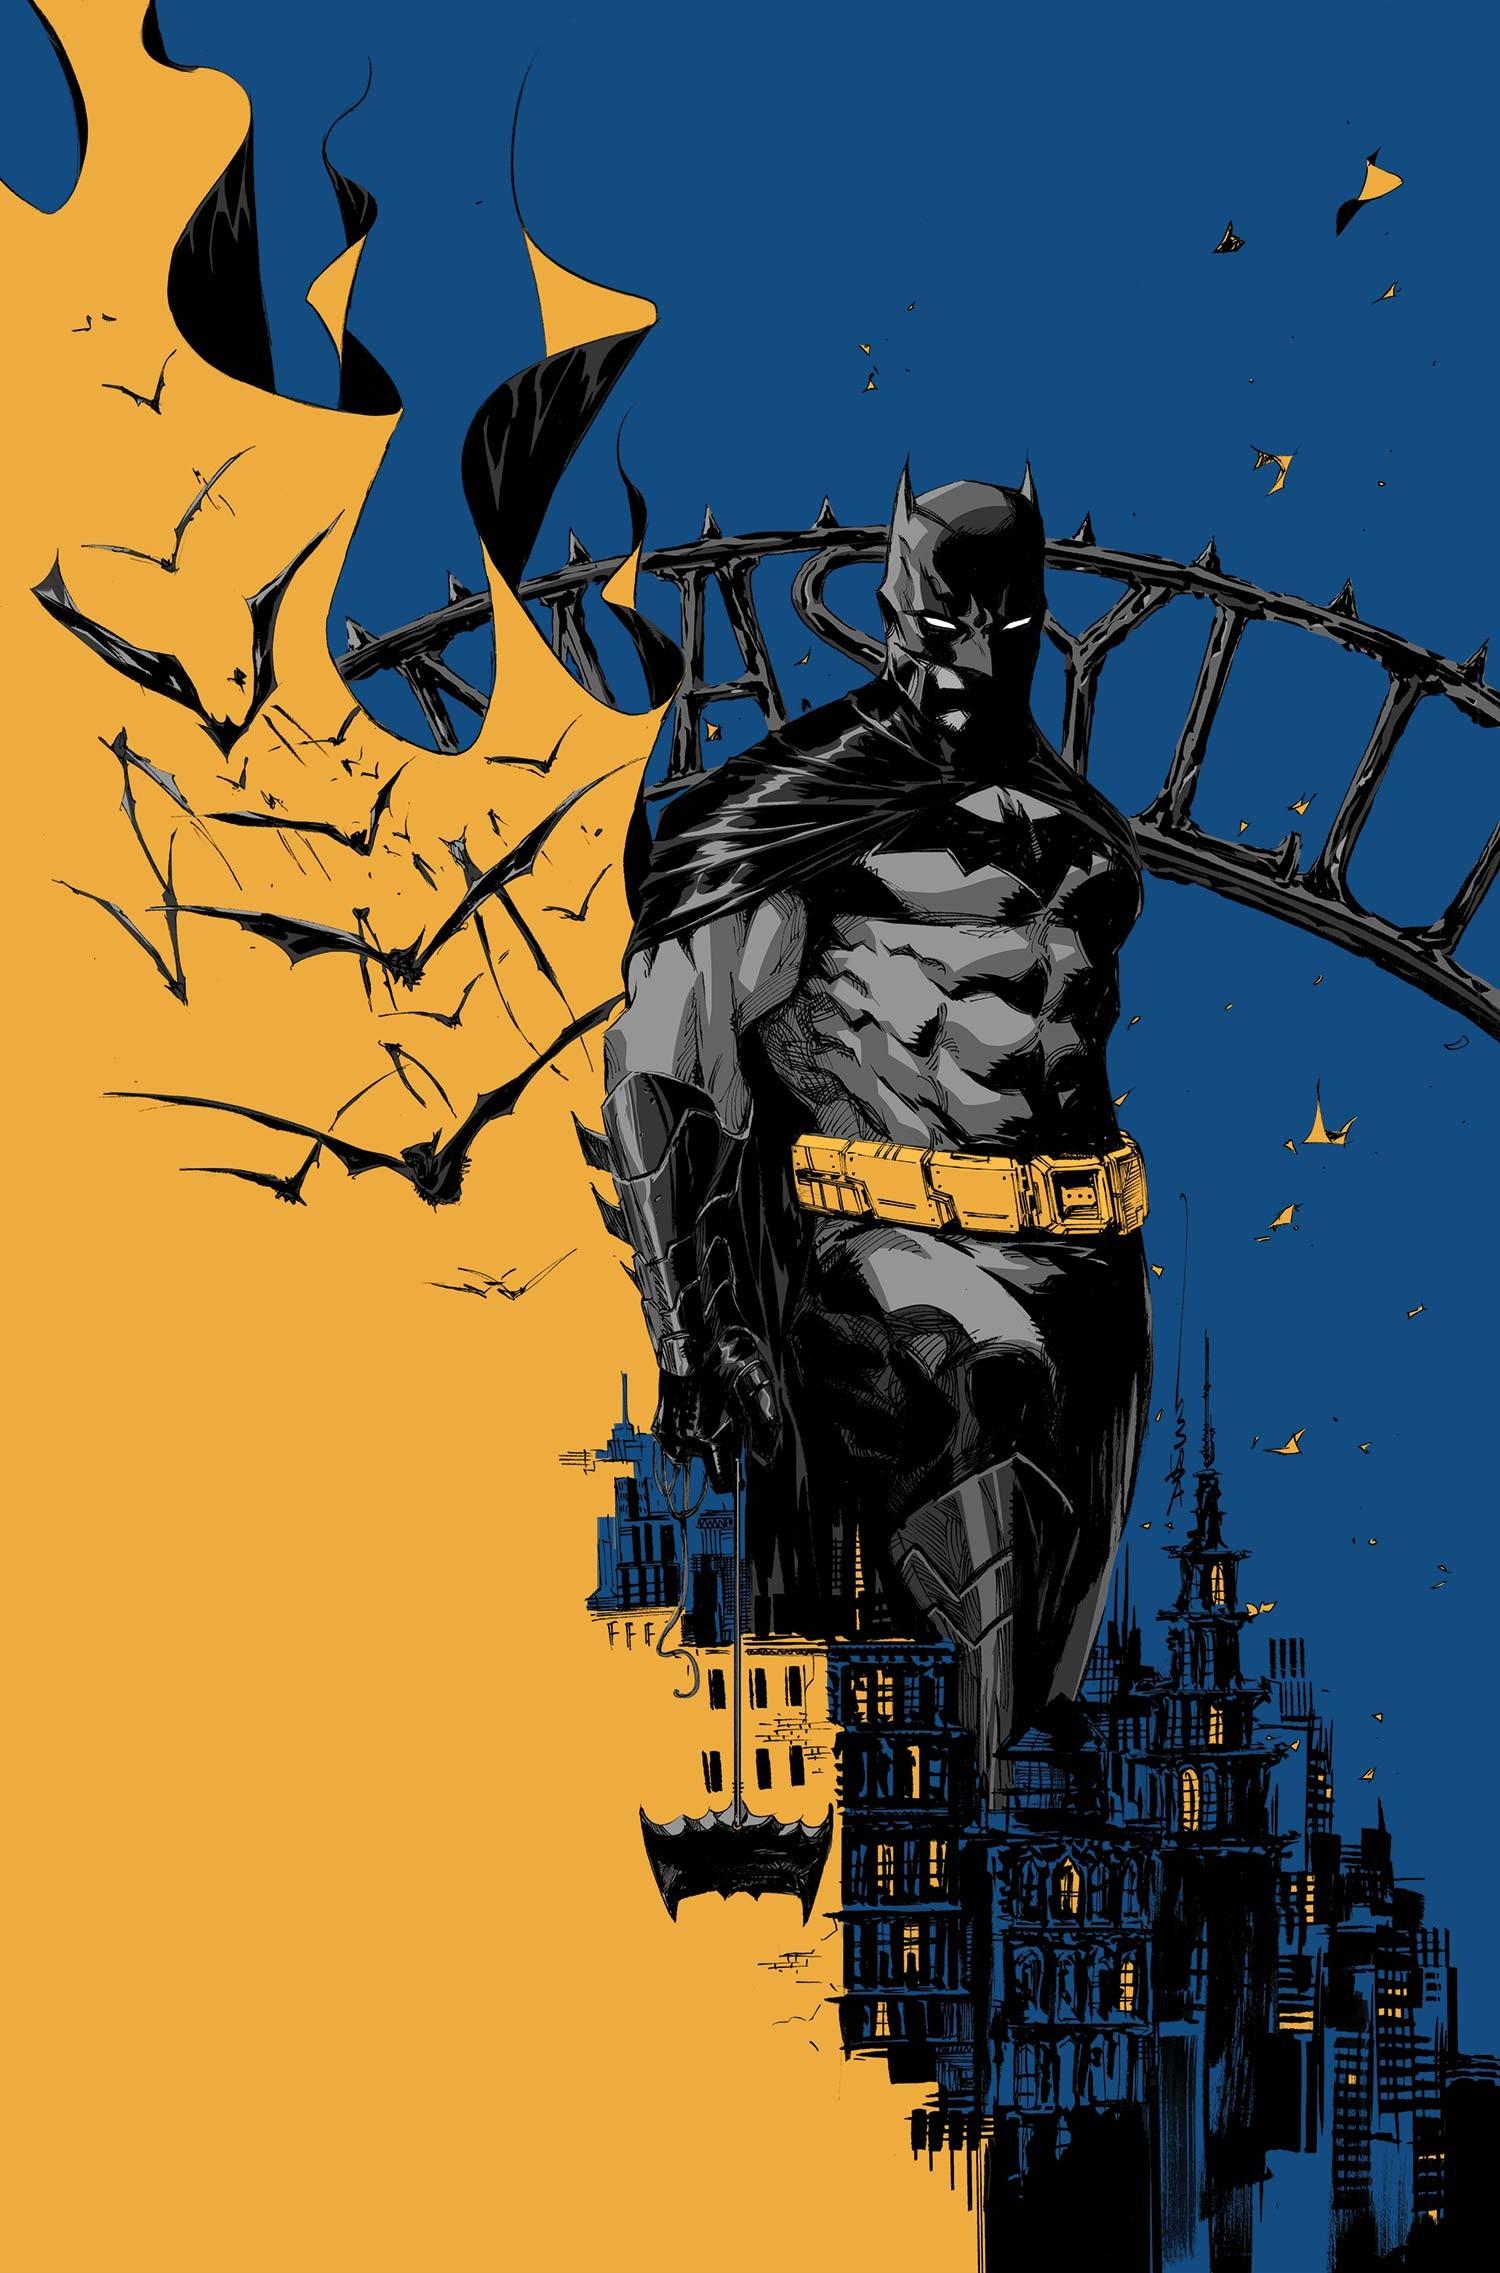 Batman return of the caped crusaders nuove immagini dal cartone